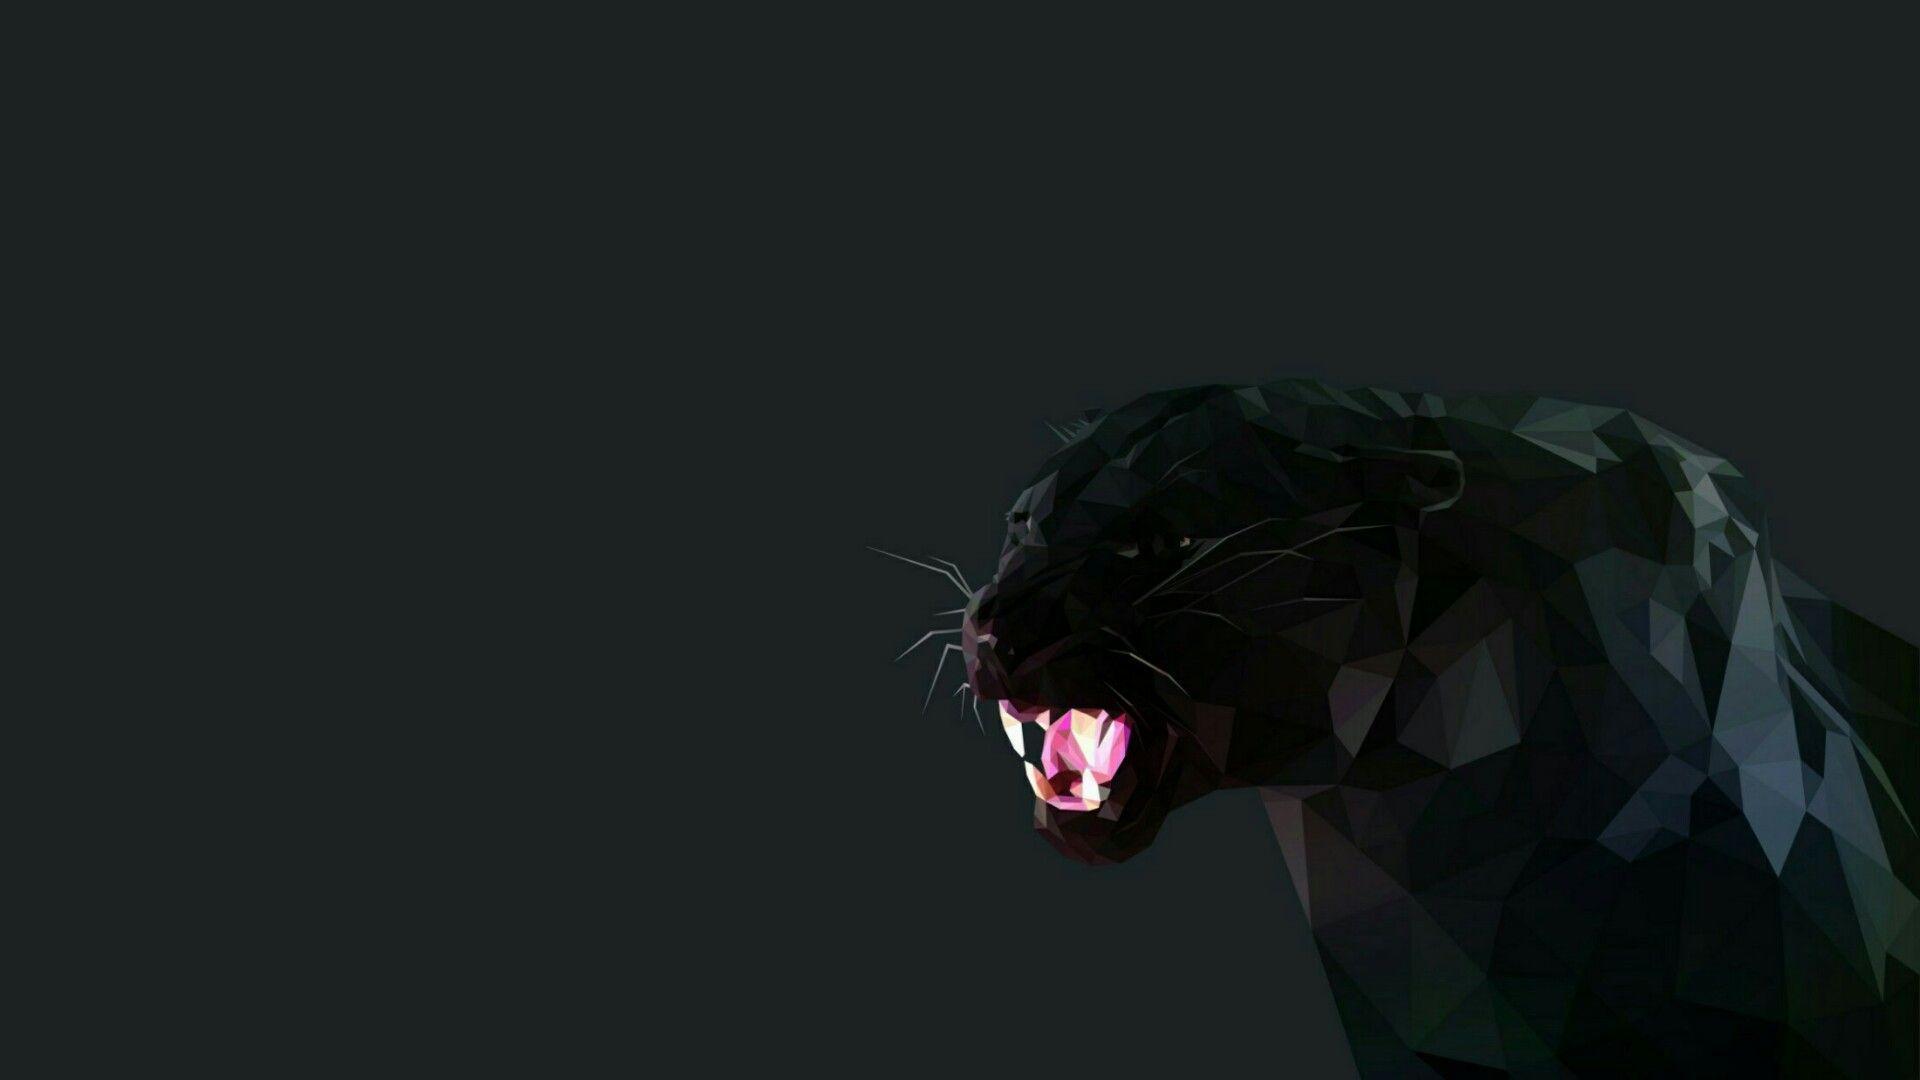 64 Best Free Black Panther Laptop Wallpapers Wallpaperaccess